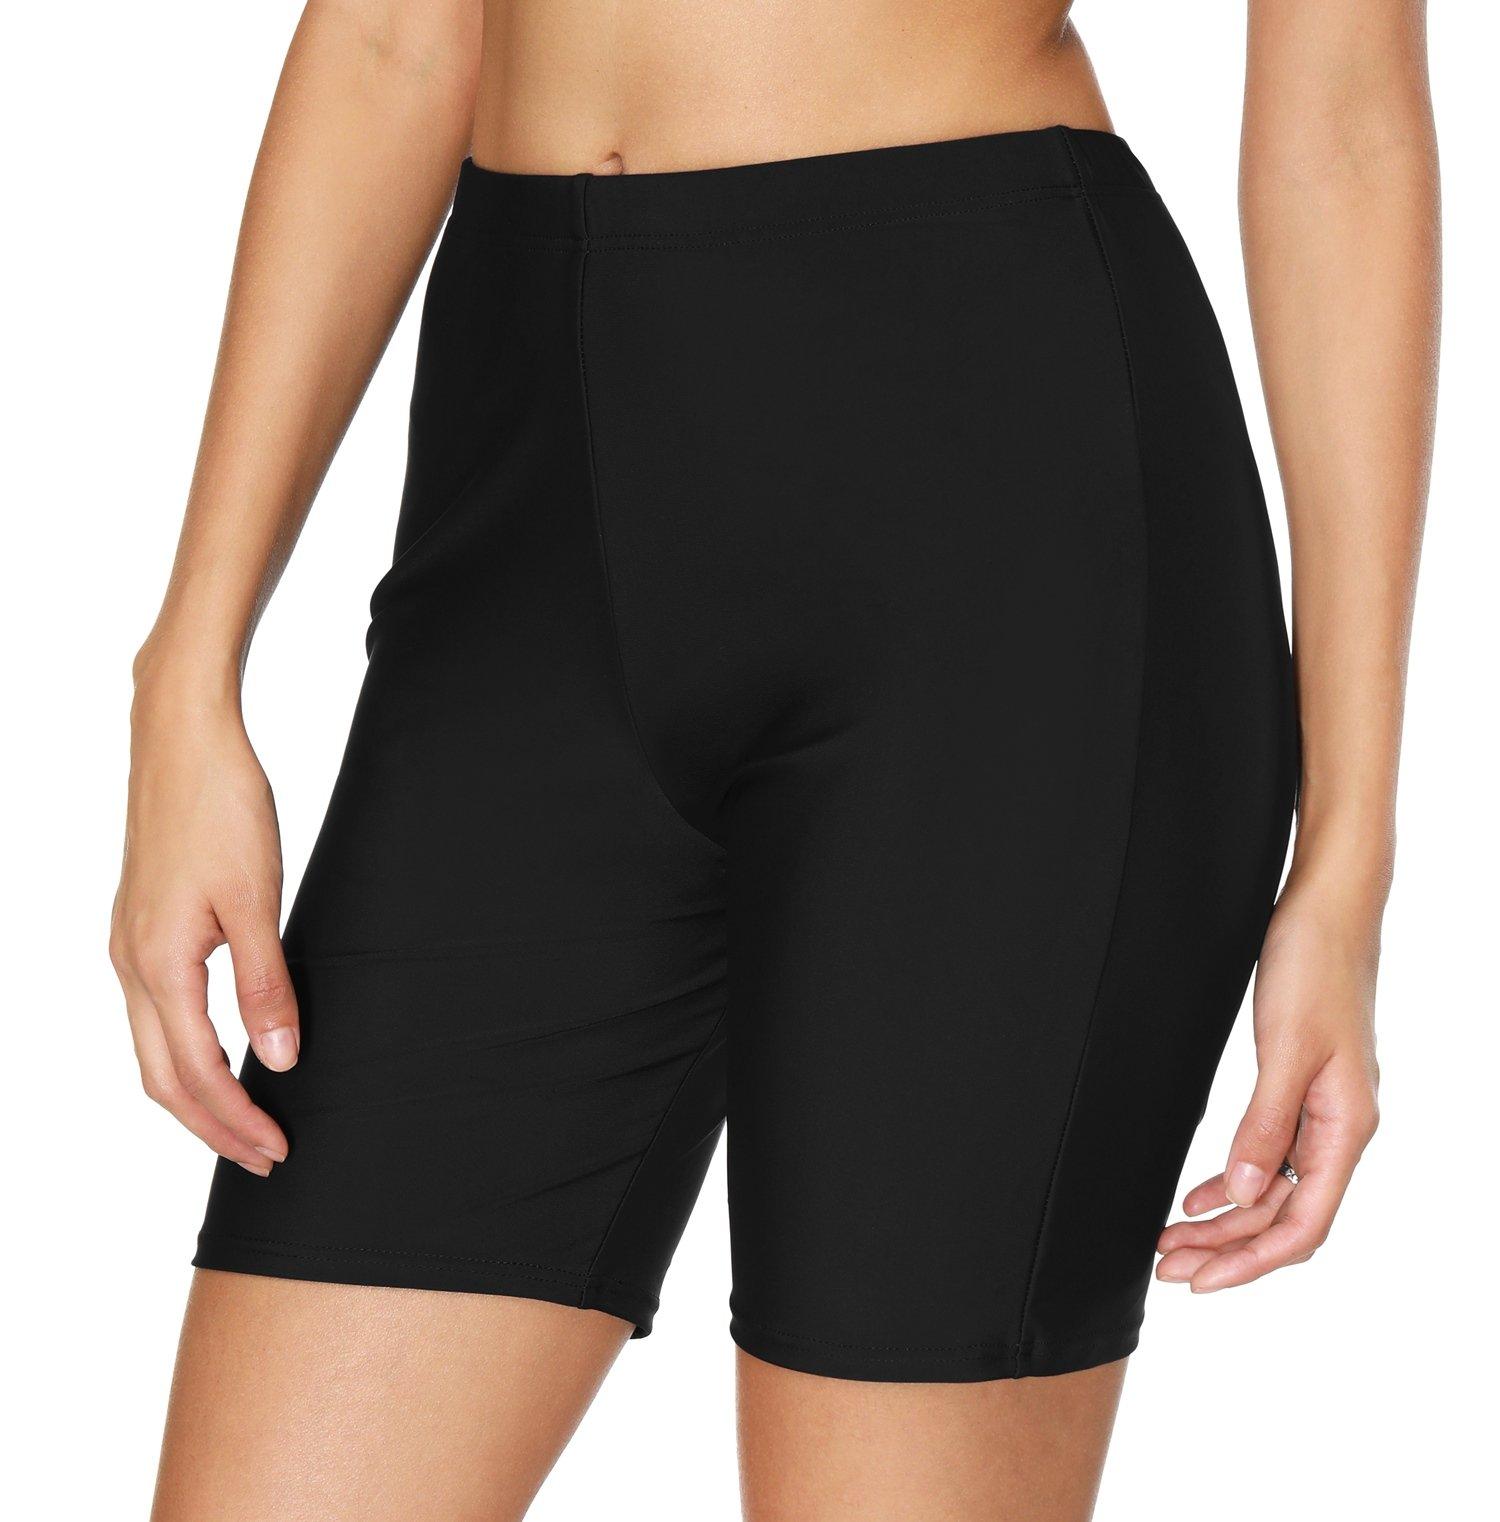 ATTRACO Women Swimwear Shorts Solid Tankini Shorts Tummy Control Black Medium